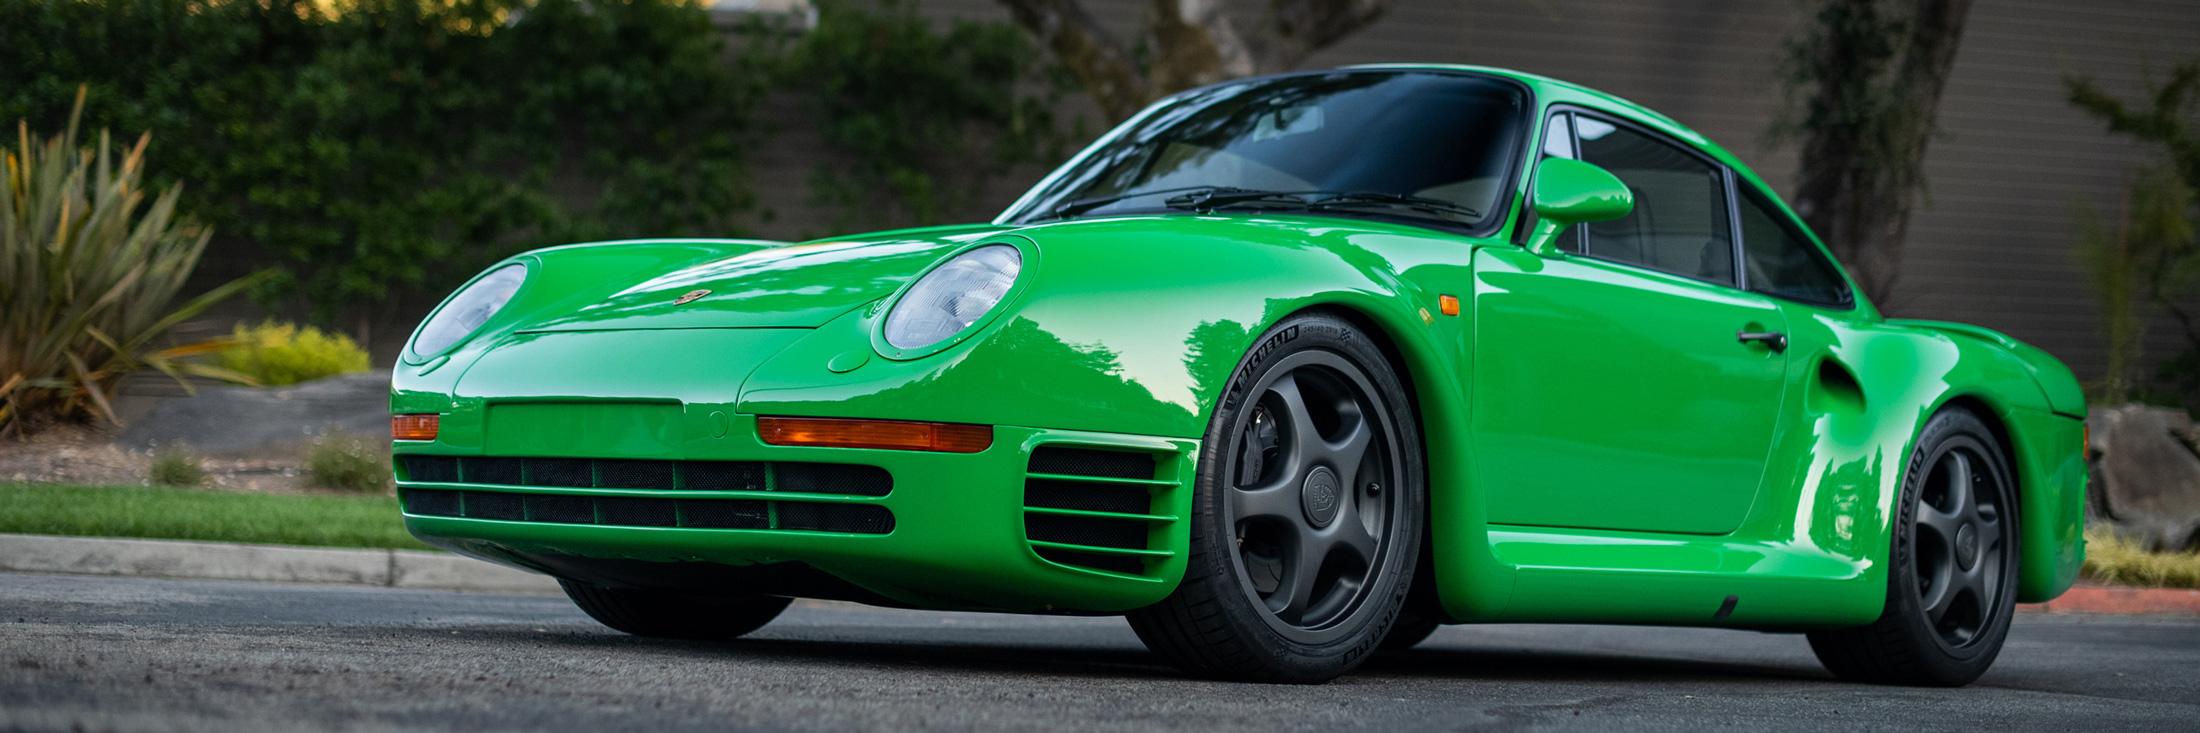 Porsche 959SC Green 007